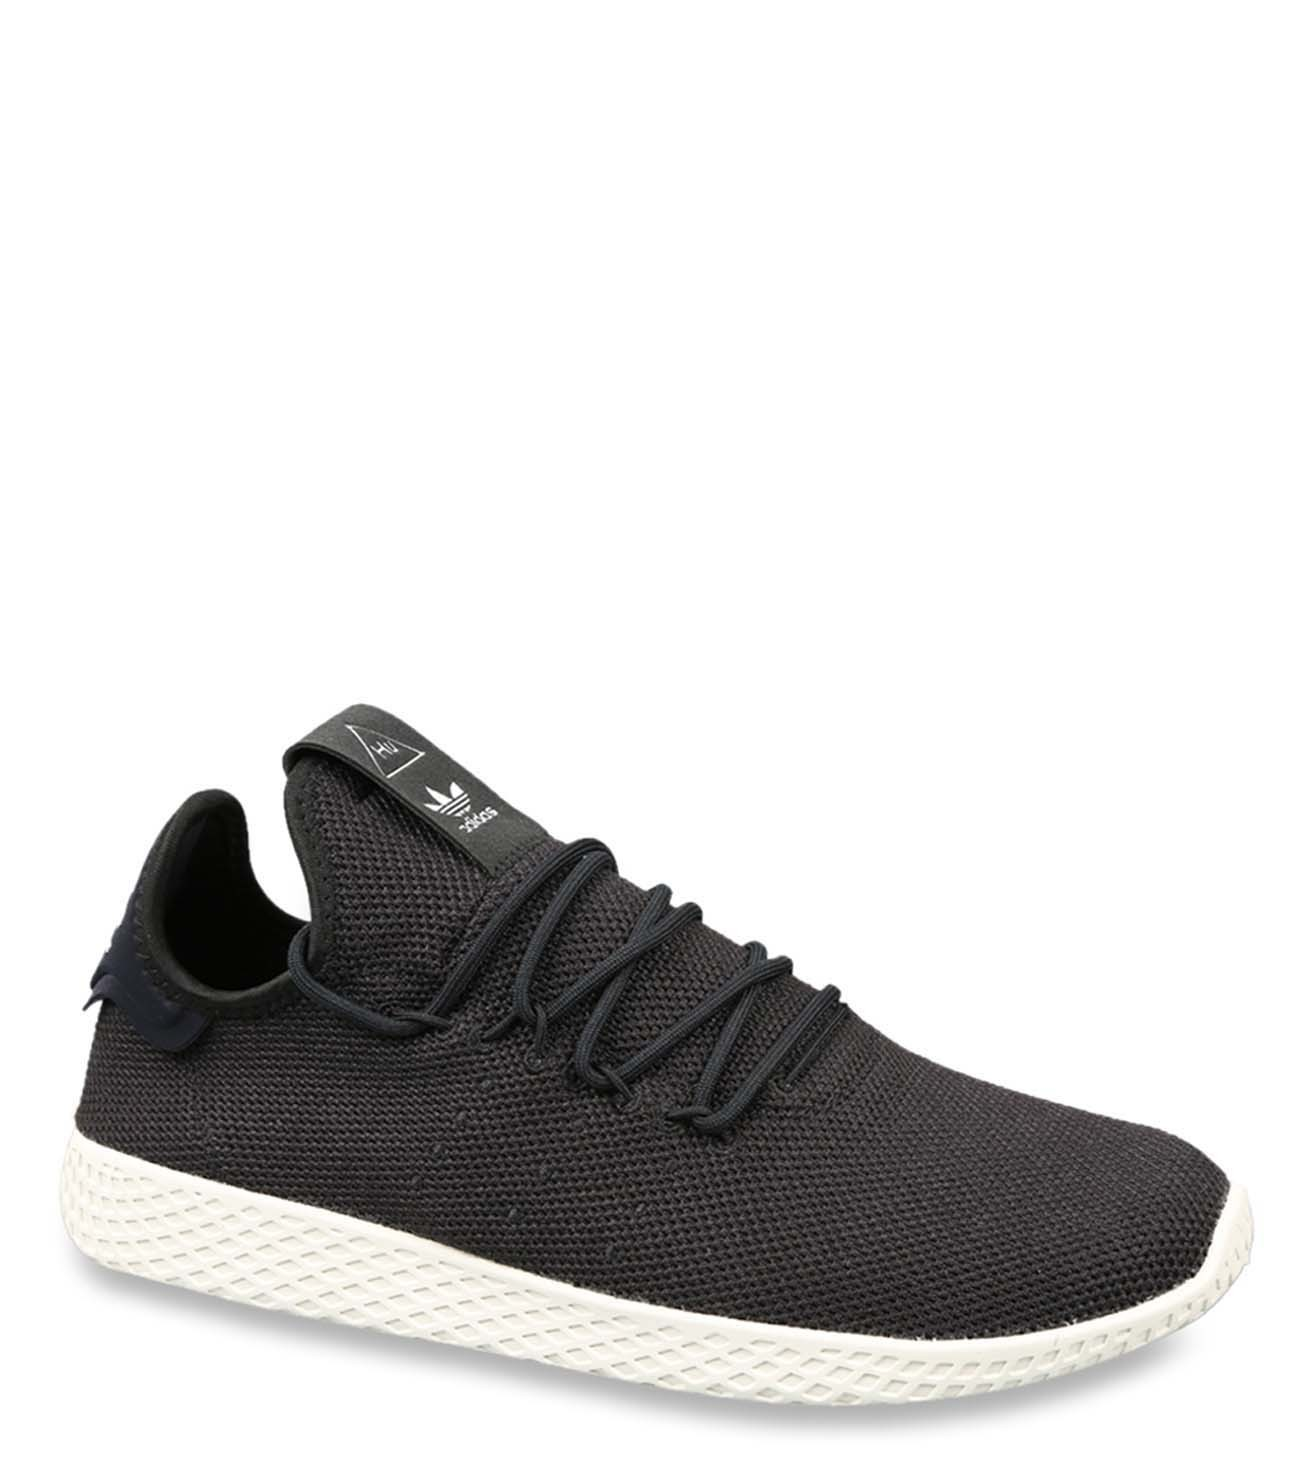 PW Tennis HU Men Sneakers